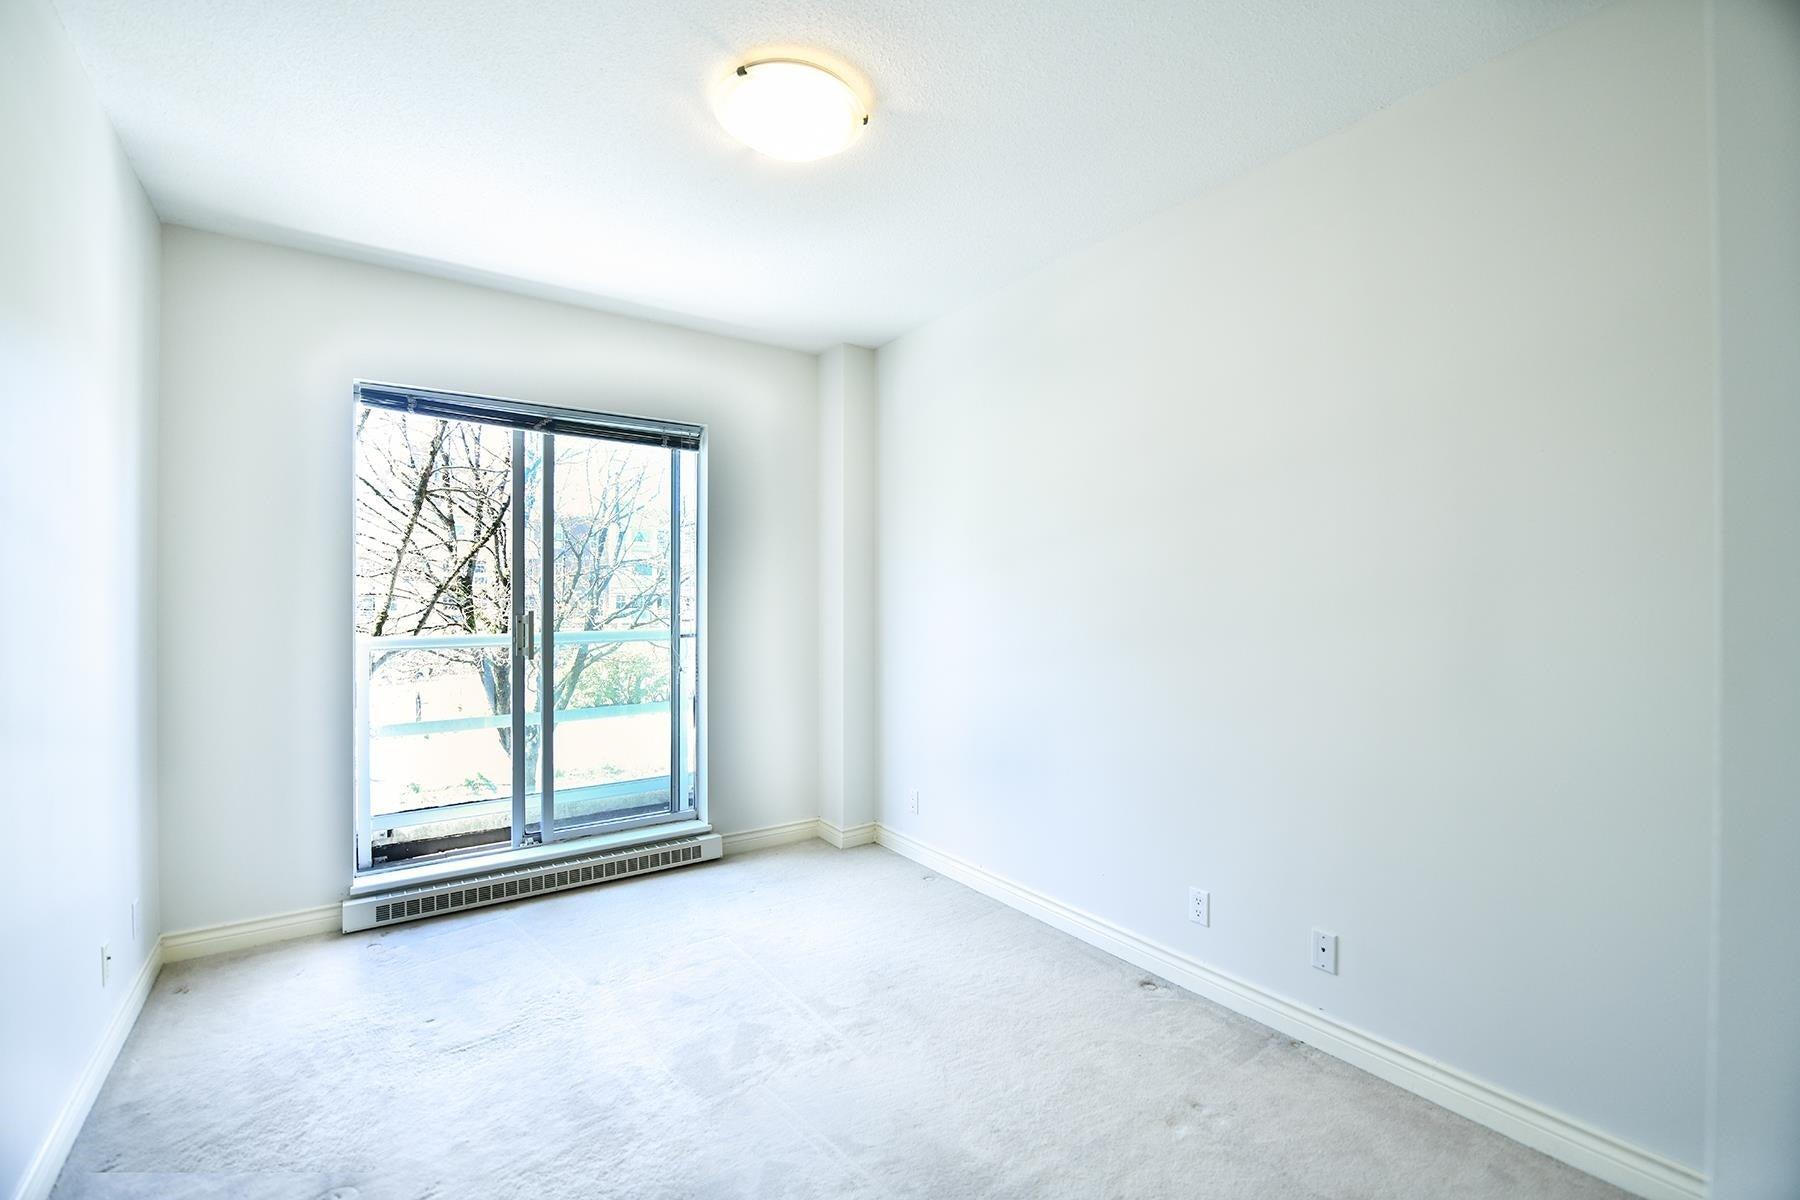 204 5790 EAST BOULEVARD - Kerrisdale Apartment/Condo for sale, 3 Bedrooms (R2604138) - #16